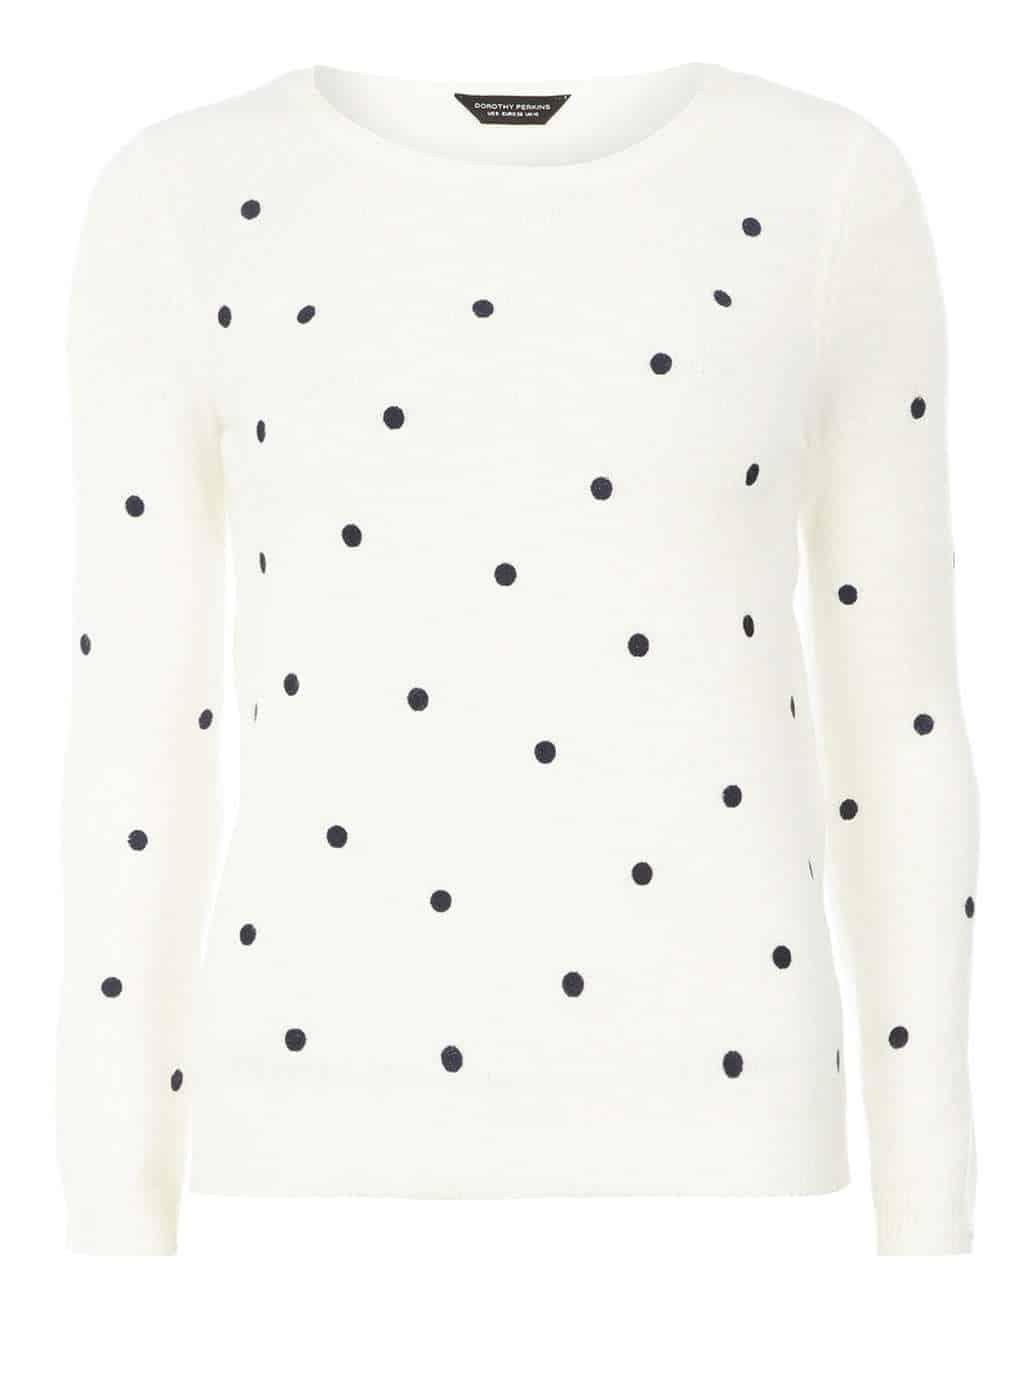 Ivory Polka Dot Knitted Jumper, $35, Dorothy Perkins